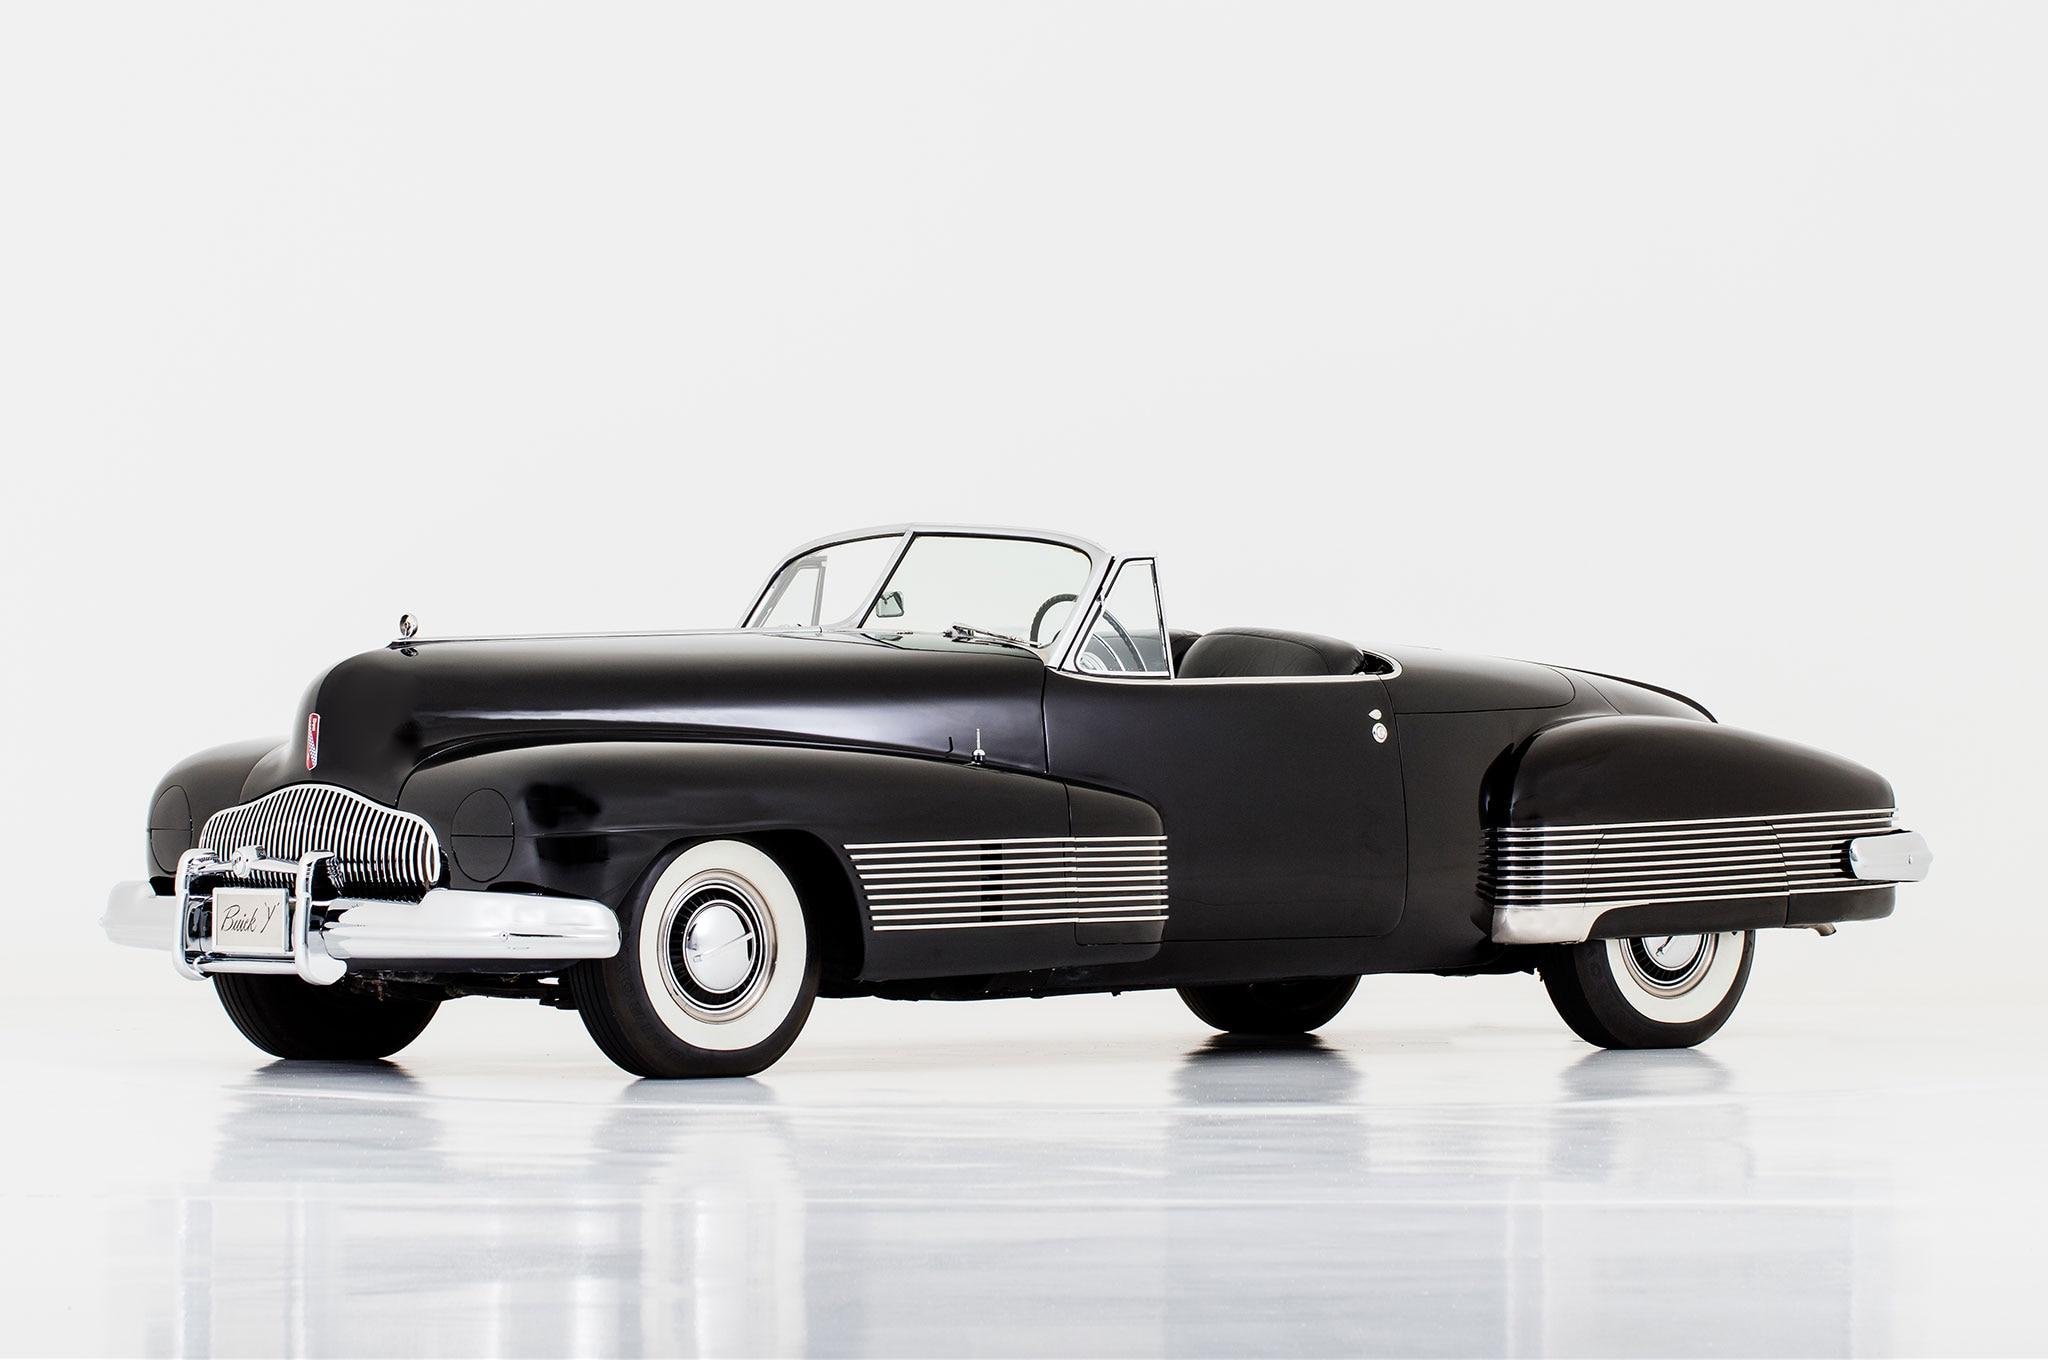 1938 Buick Y Job HVA National Historic Vehicle Register Front Three Quarter